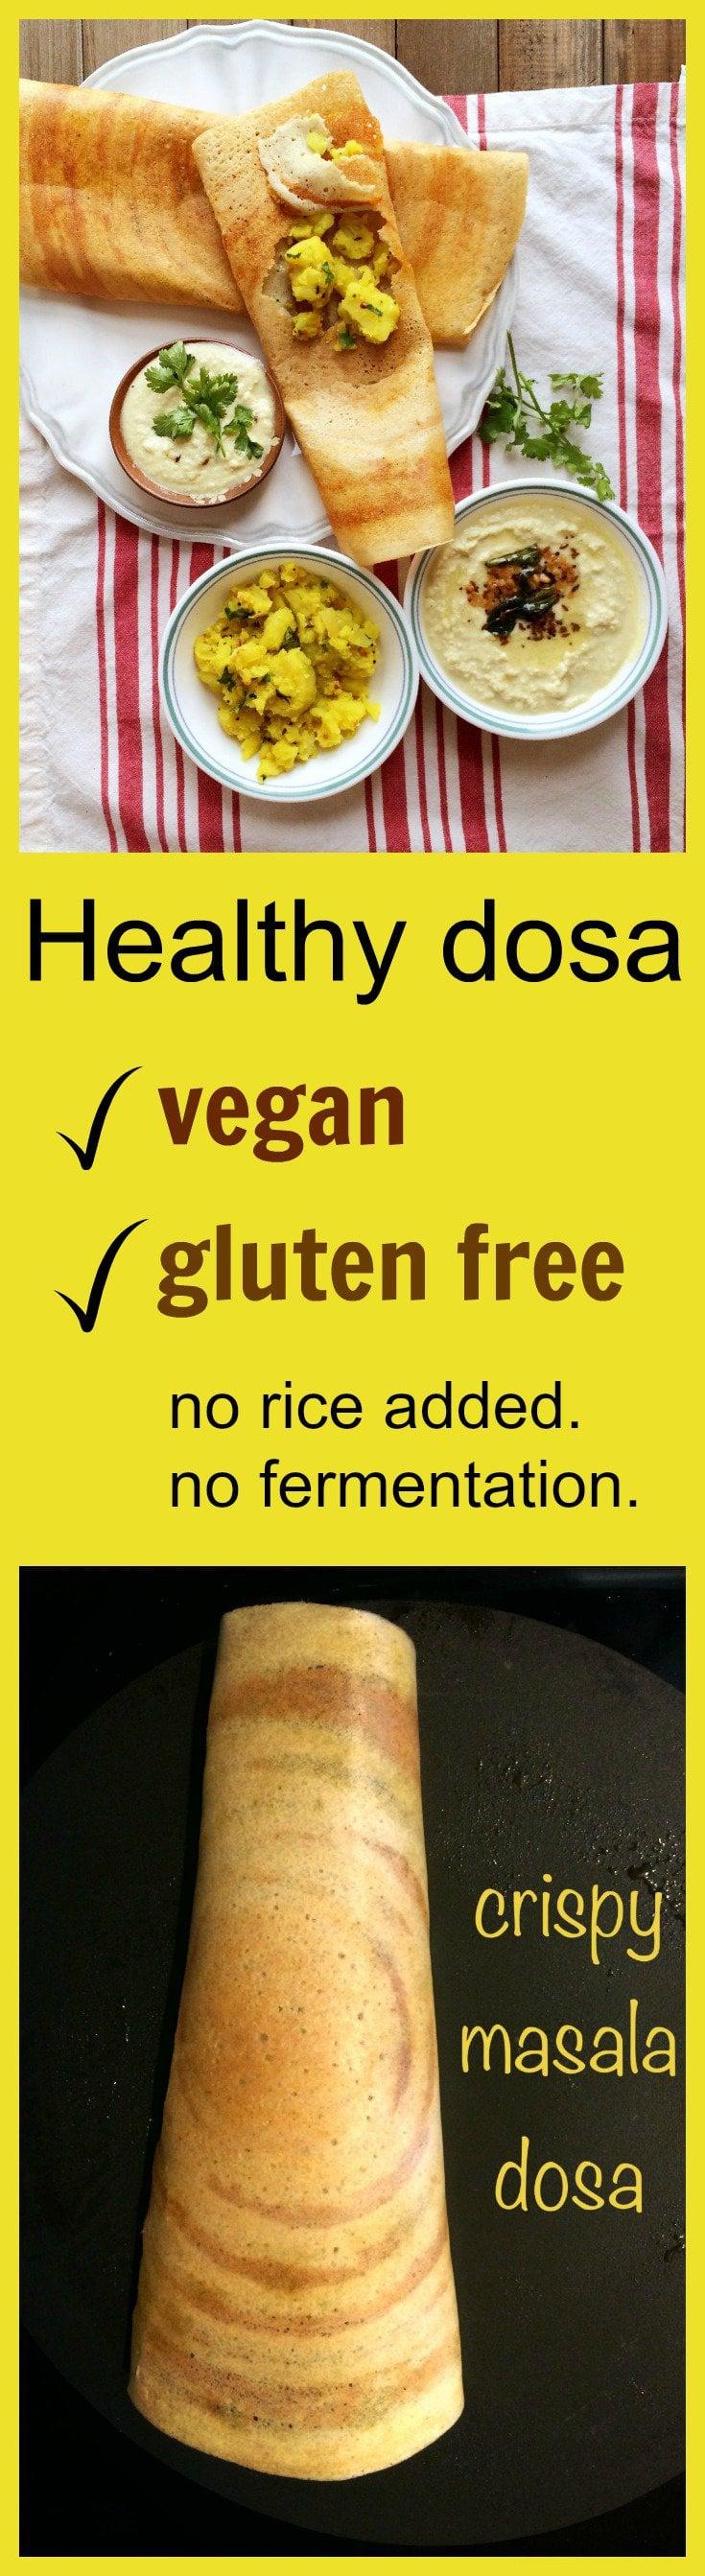 healthy no fermentation no rice dosa #vegan #glutenfree #crepes #indian #instant